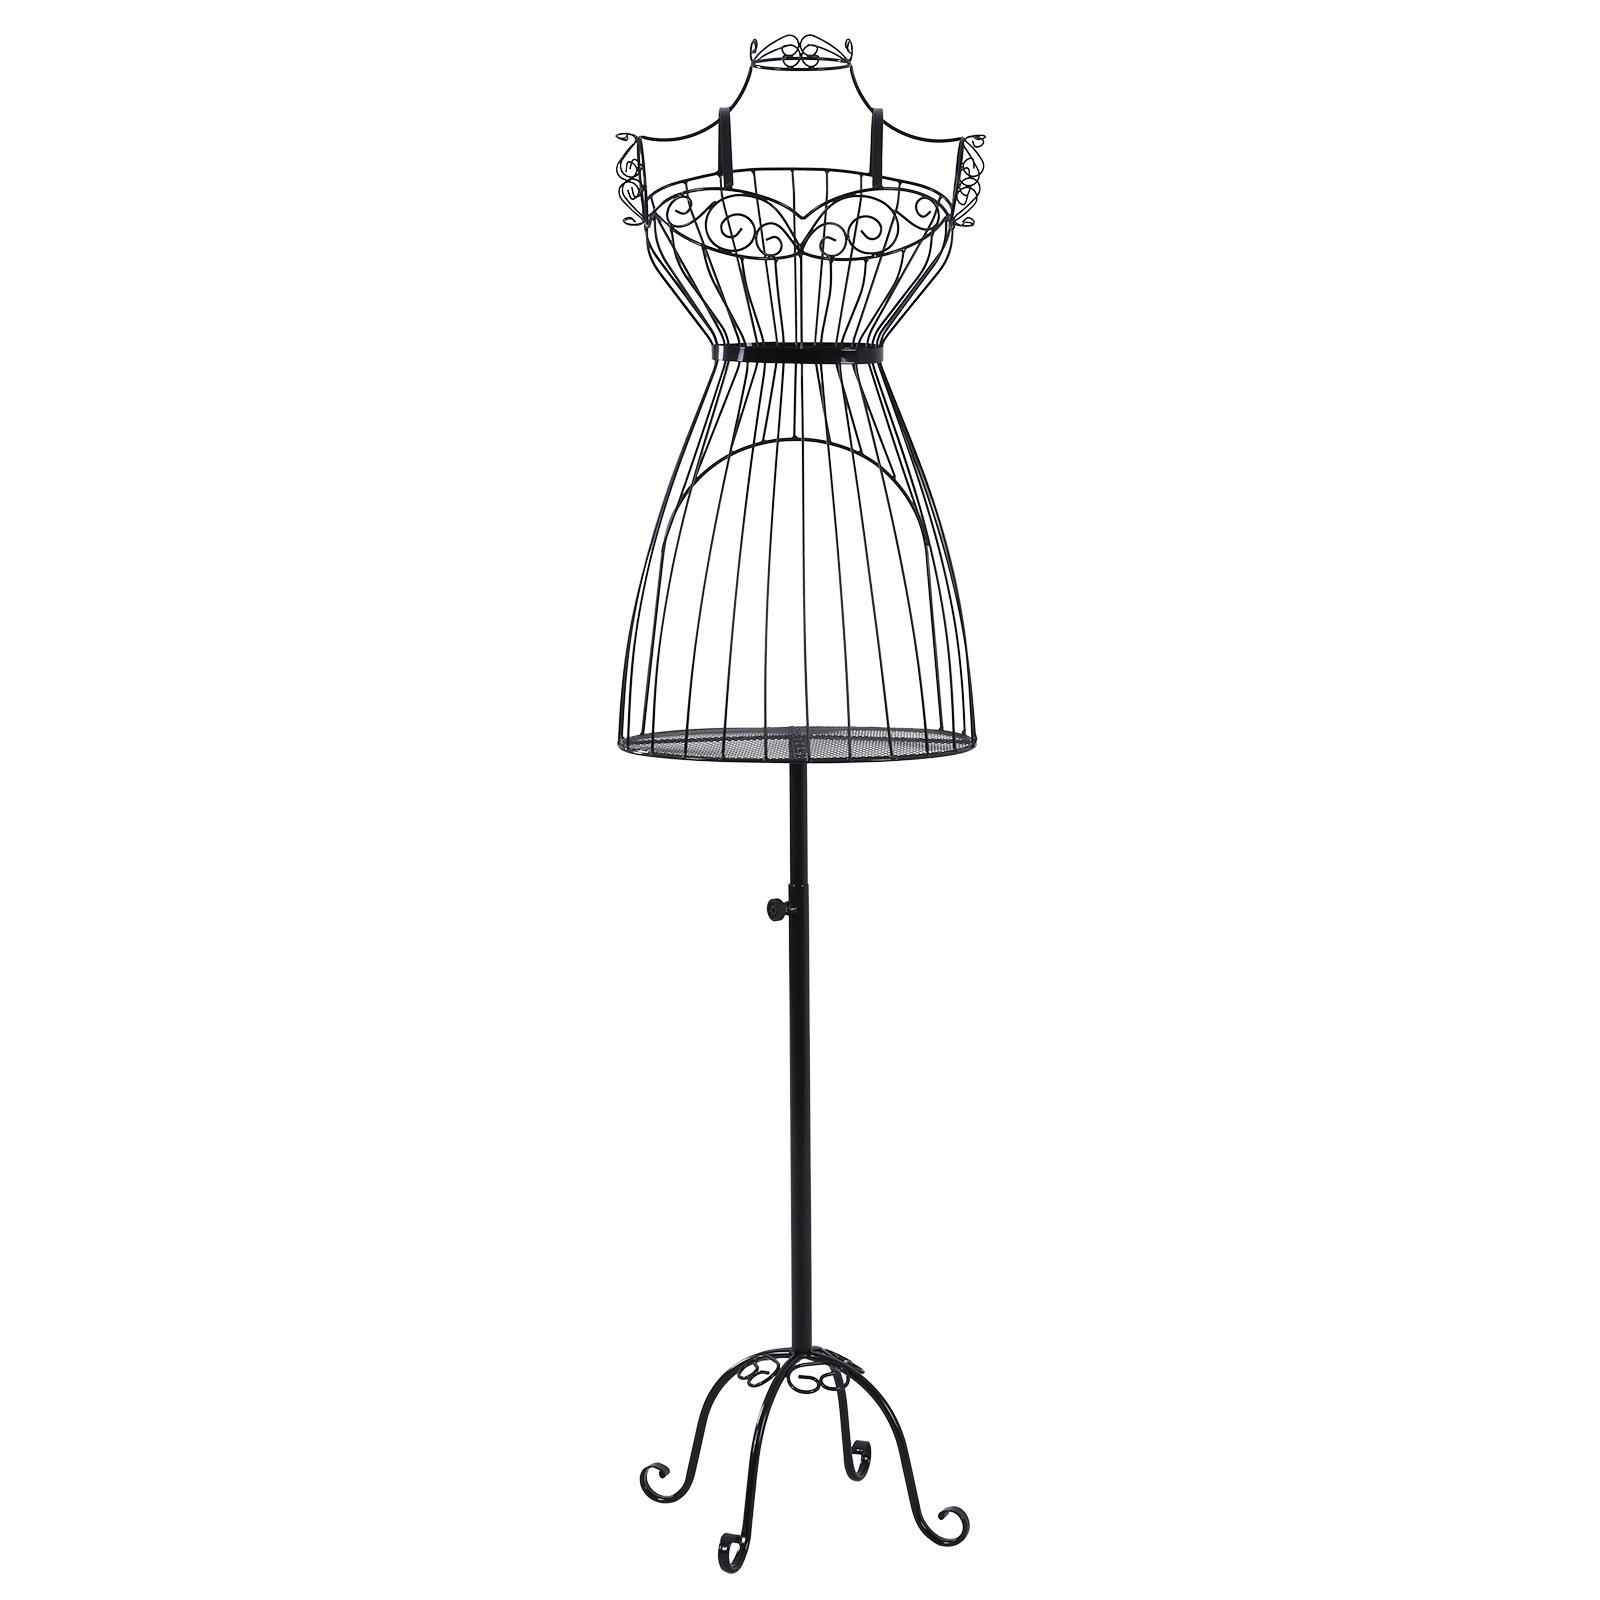 SONGMICS Busto de señora para Costura Maniquí de exposición metálico HRA09B product image